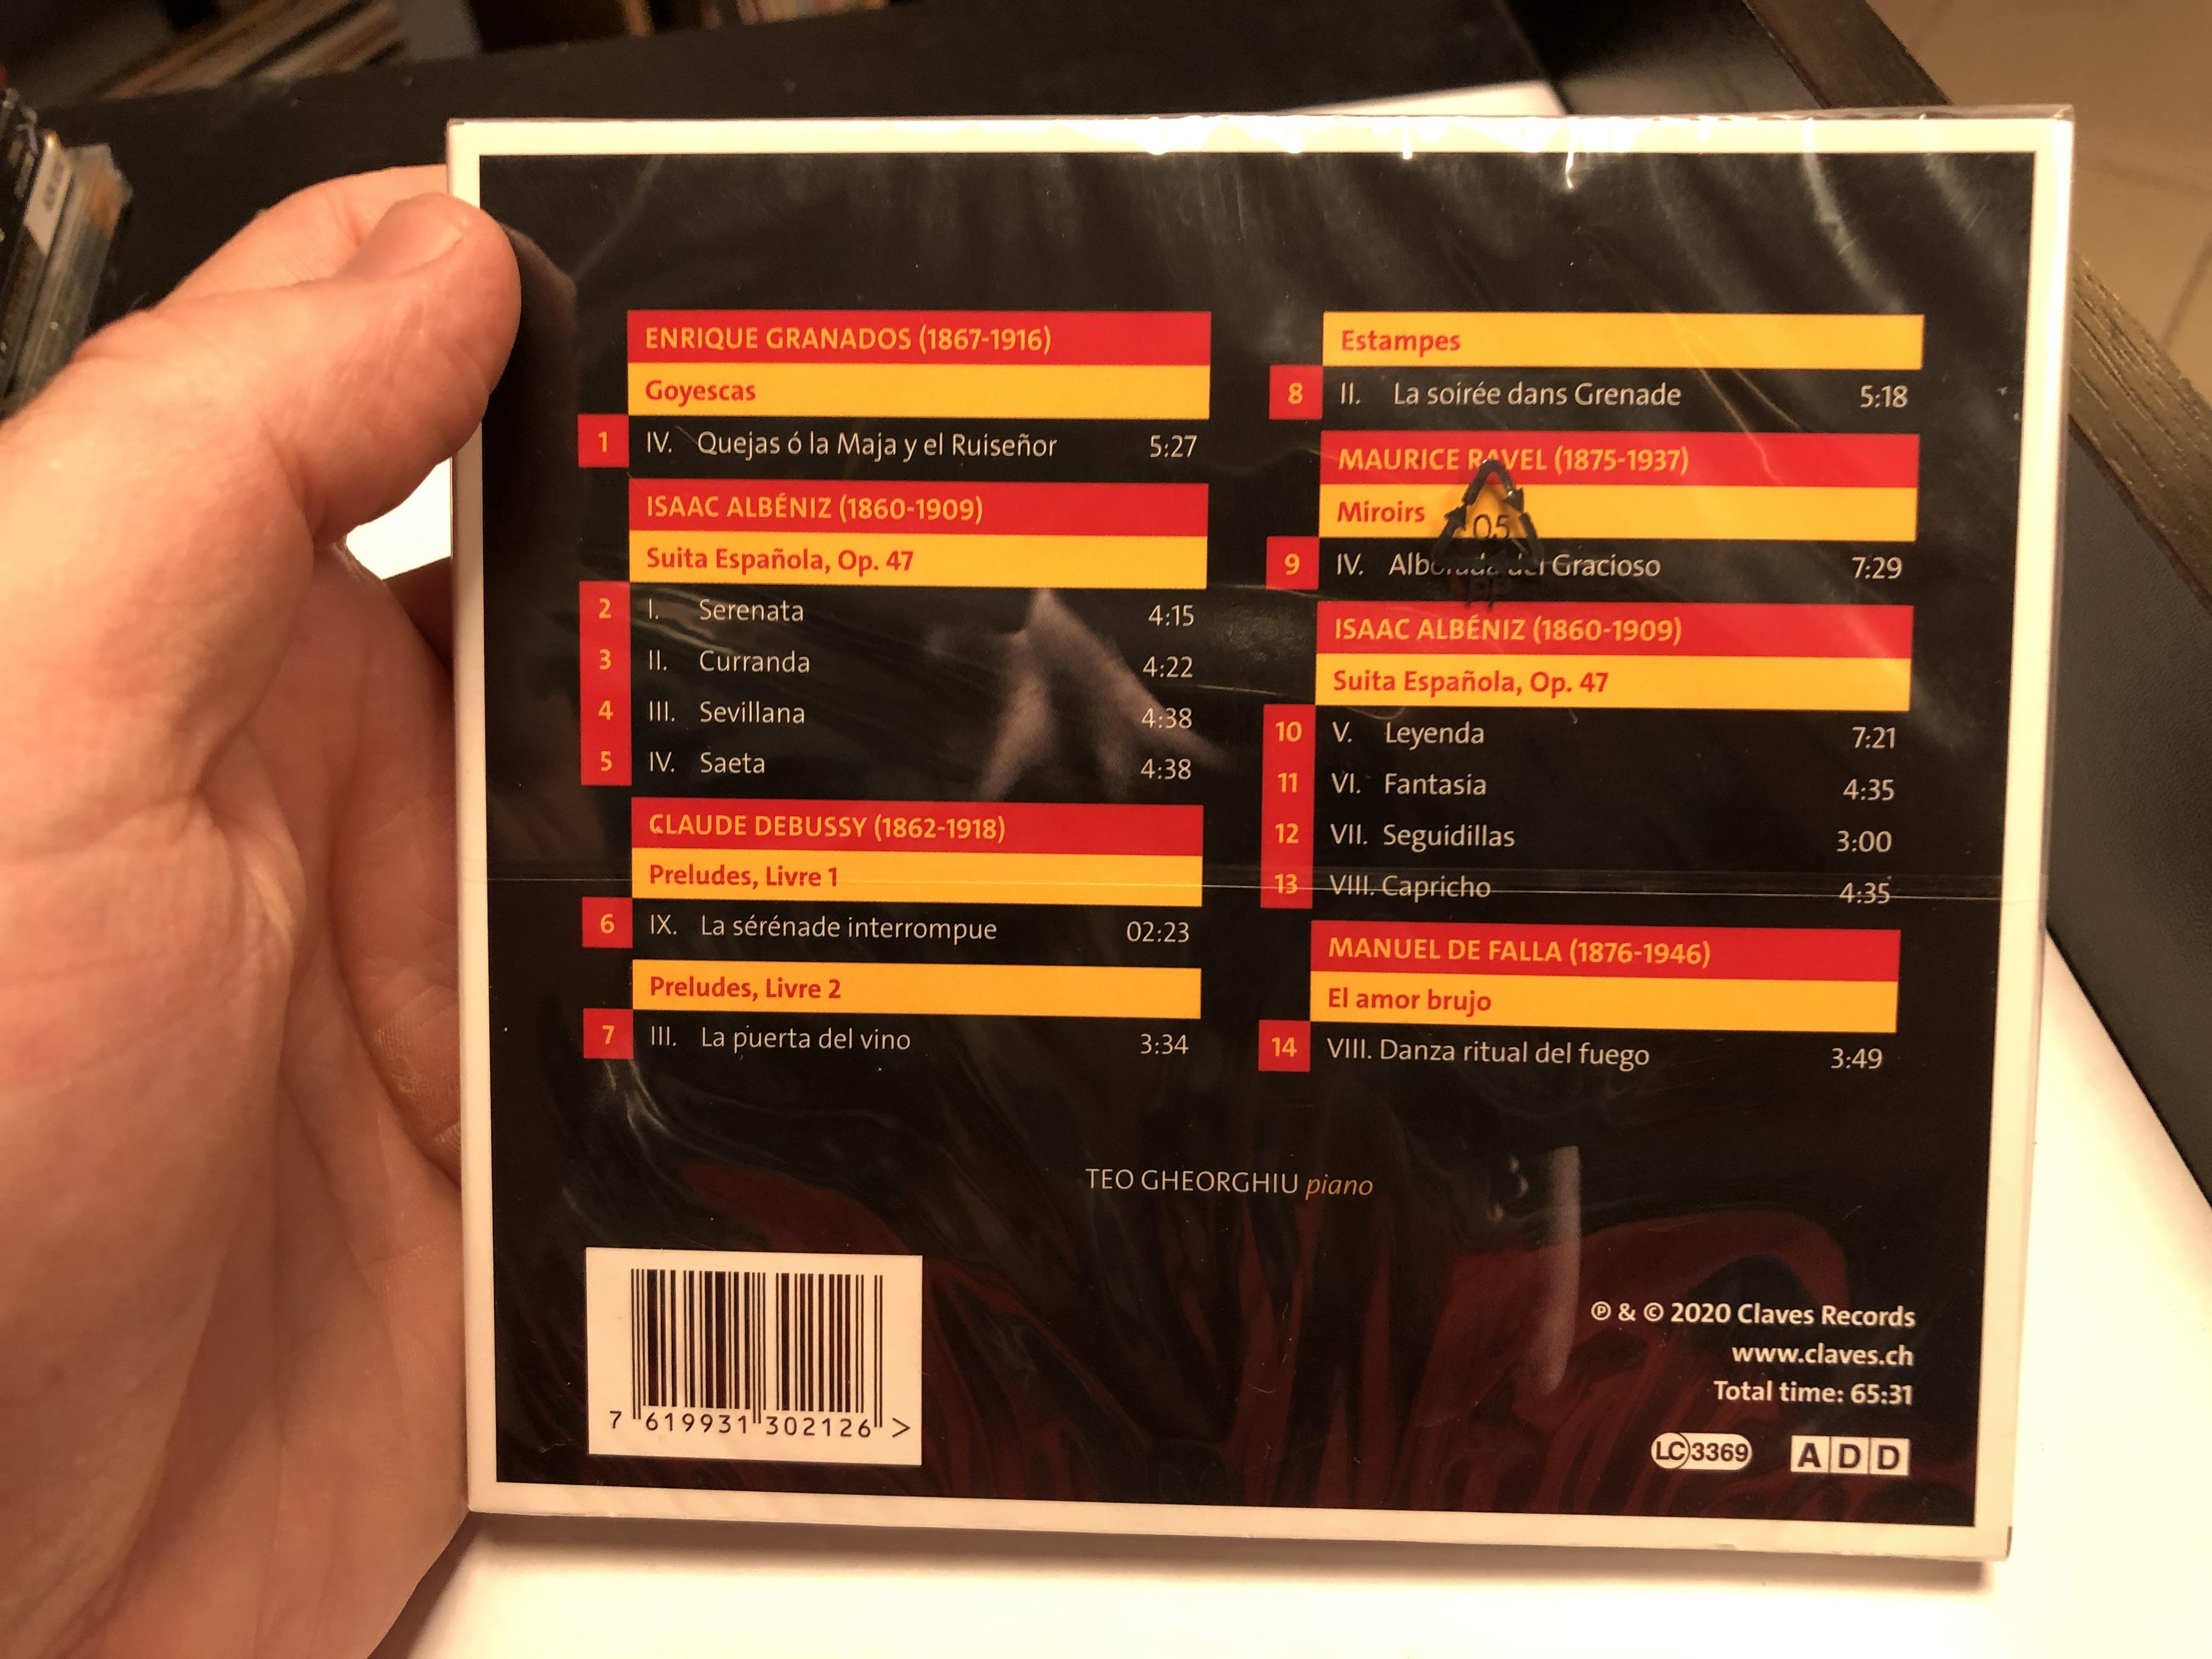 duende-teo-gheorghiu-piano-claves-records-audio-cd-2020-7619931302126-2-.jpg